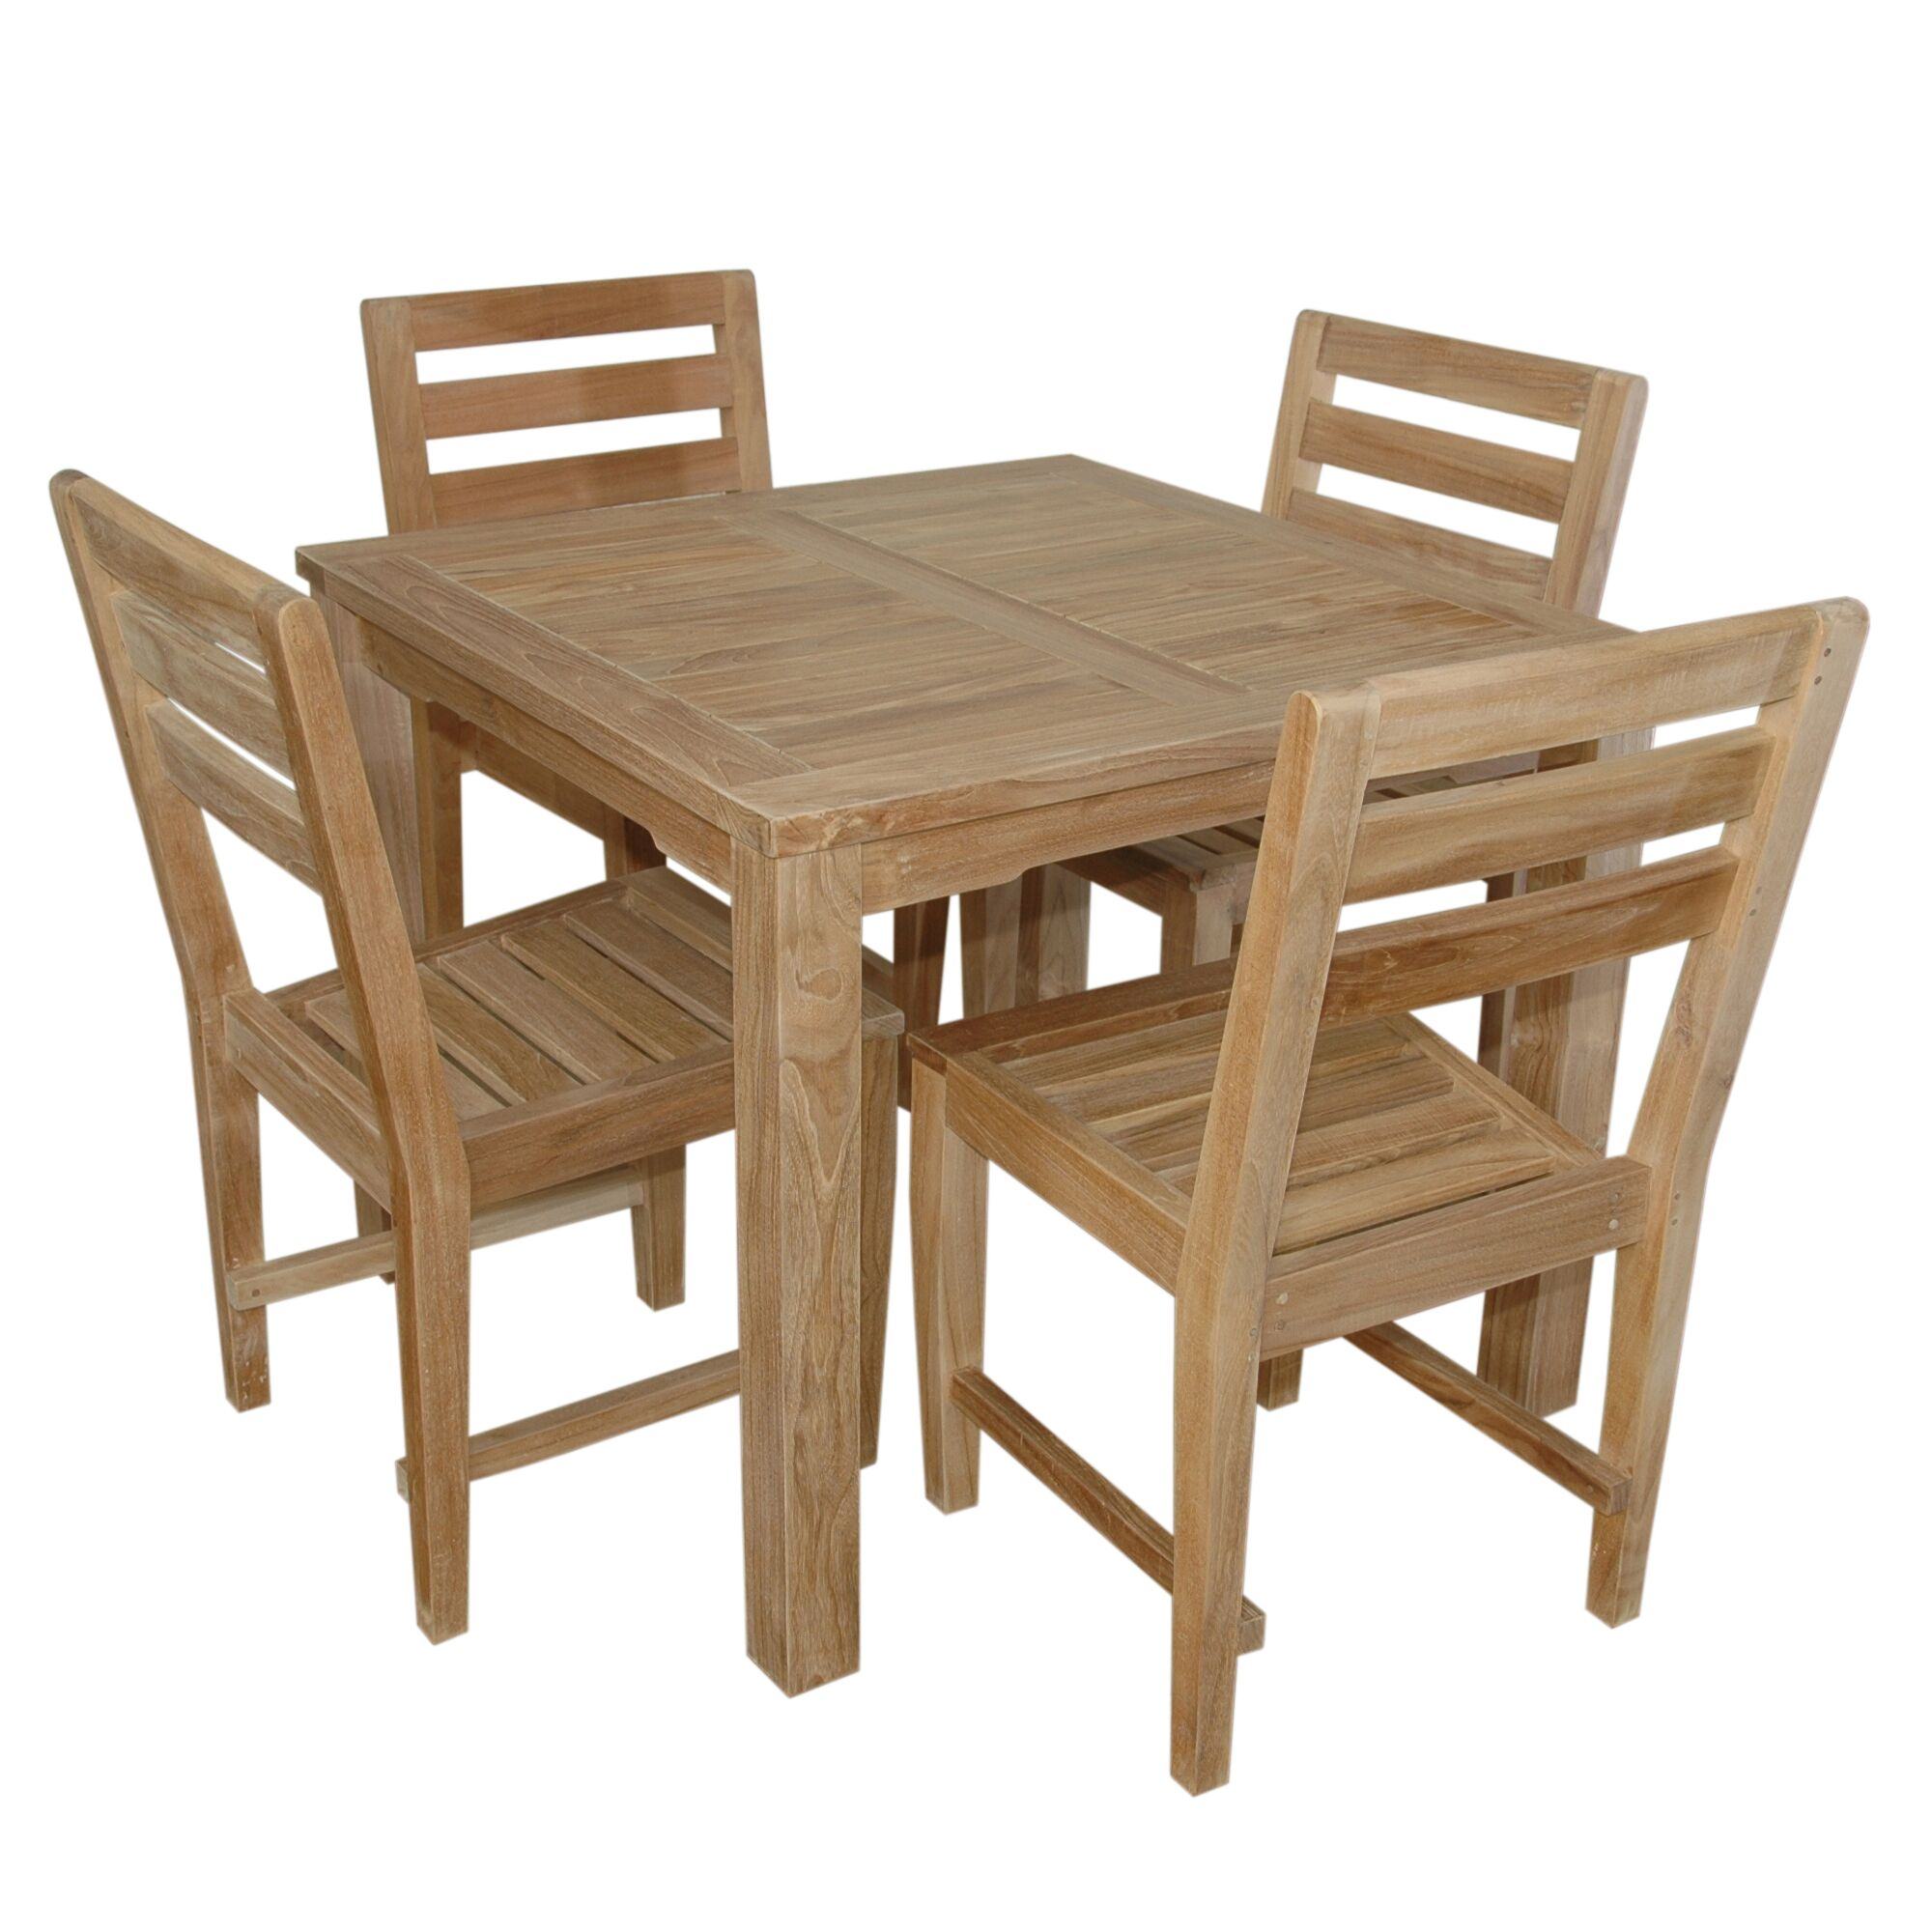 Kratz 5 Piece Teak Dining Set